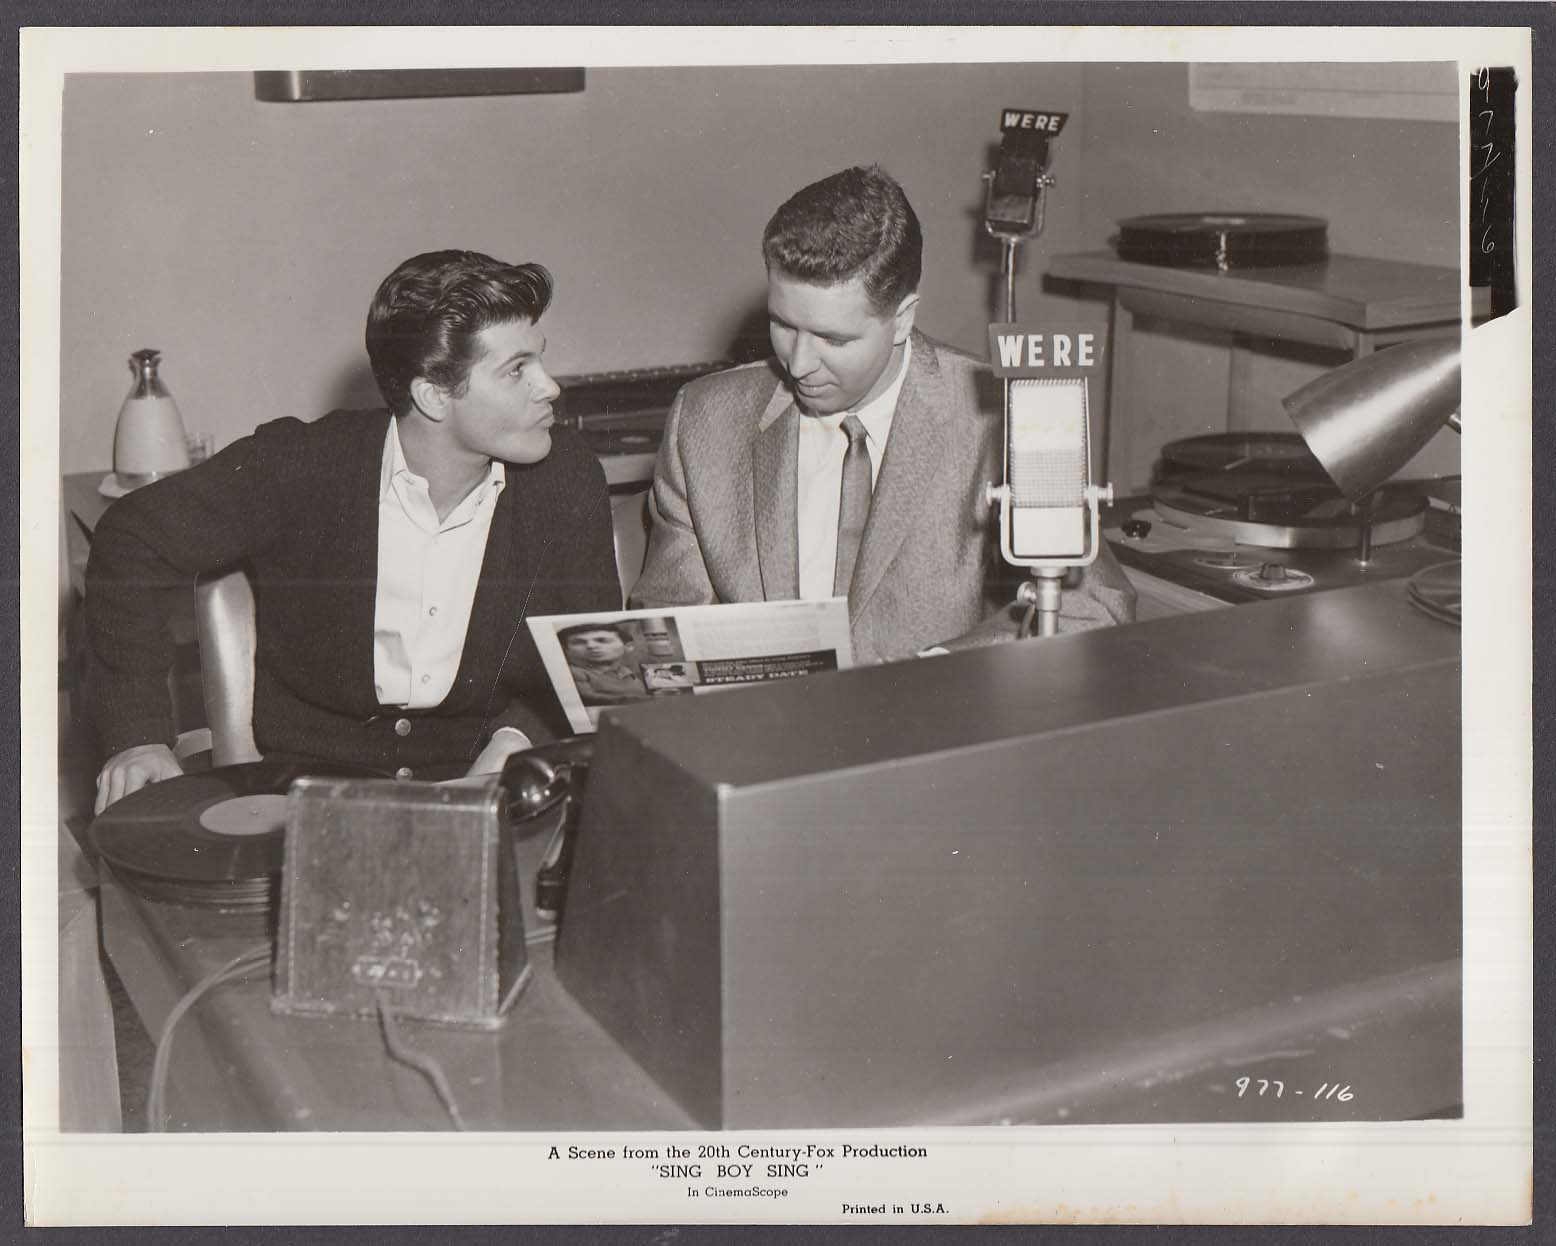 Tommy Sands & WERE DJ Bill Randle Sing Boy Sing 8x10 photo